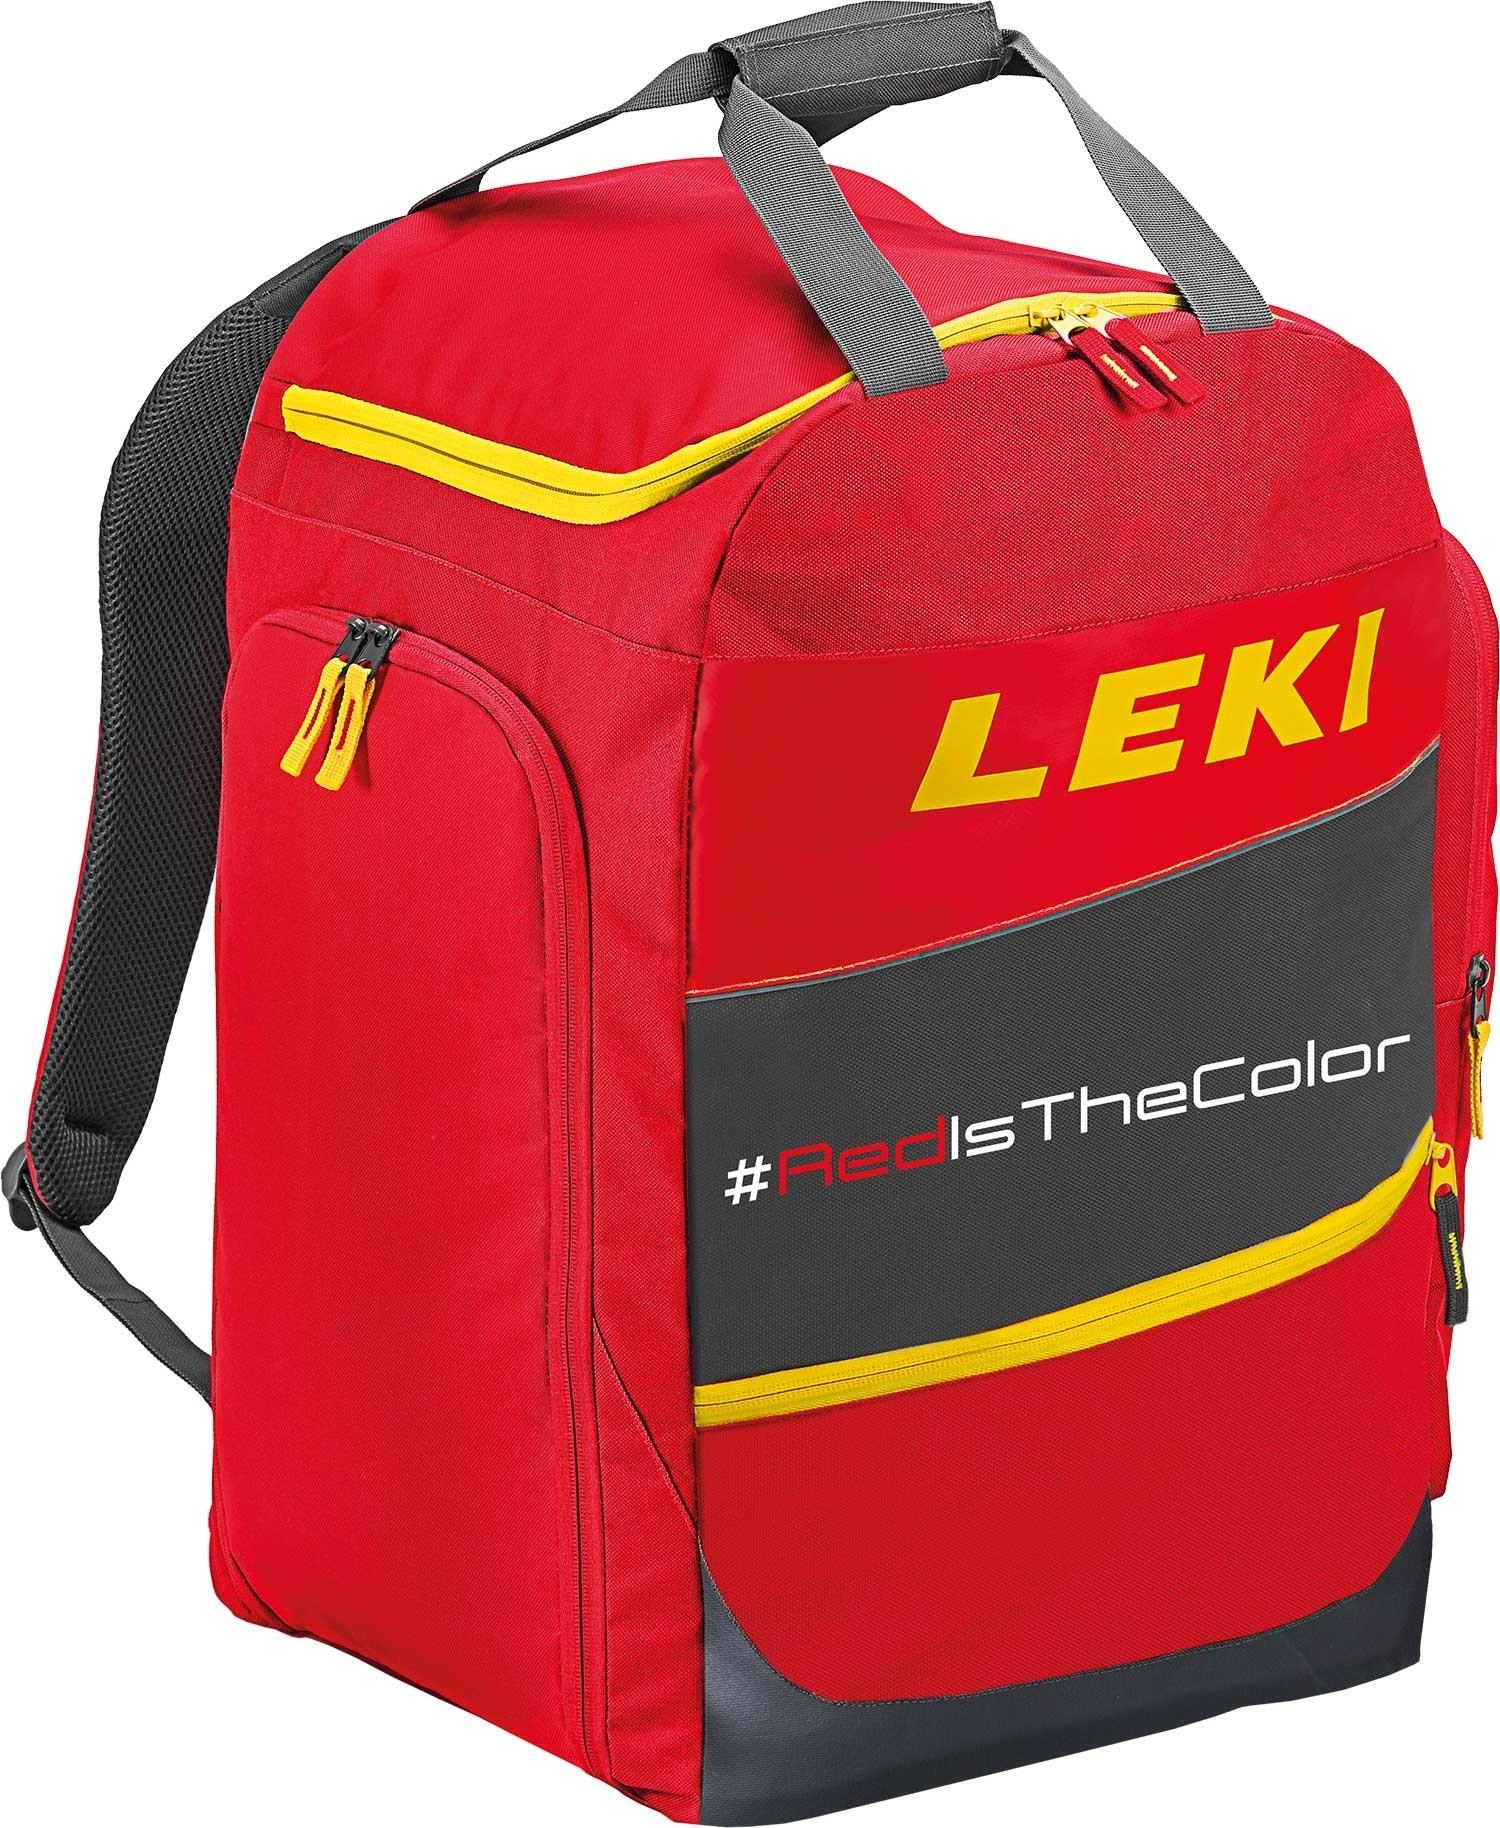 Leki bootbag red is the colour